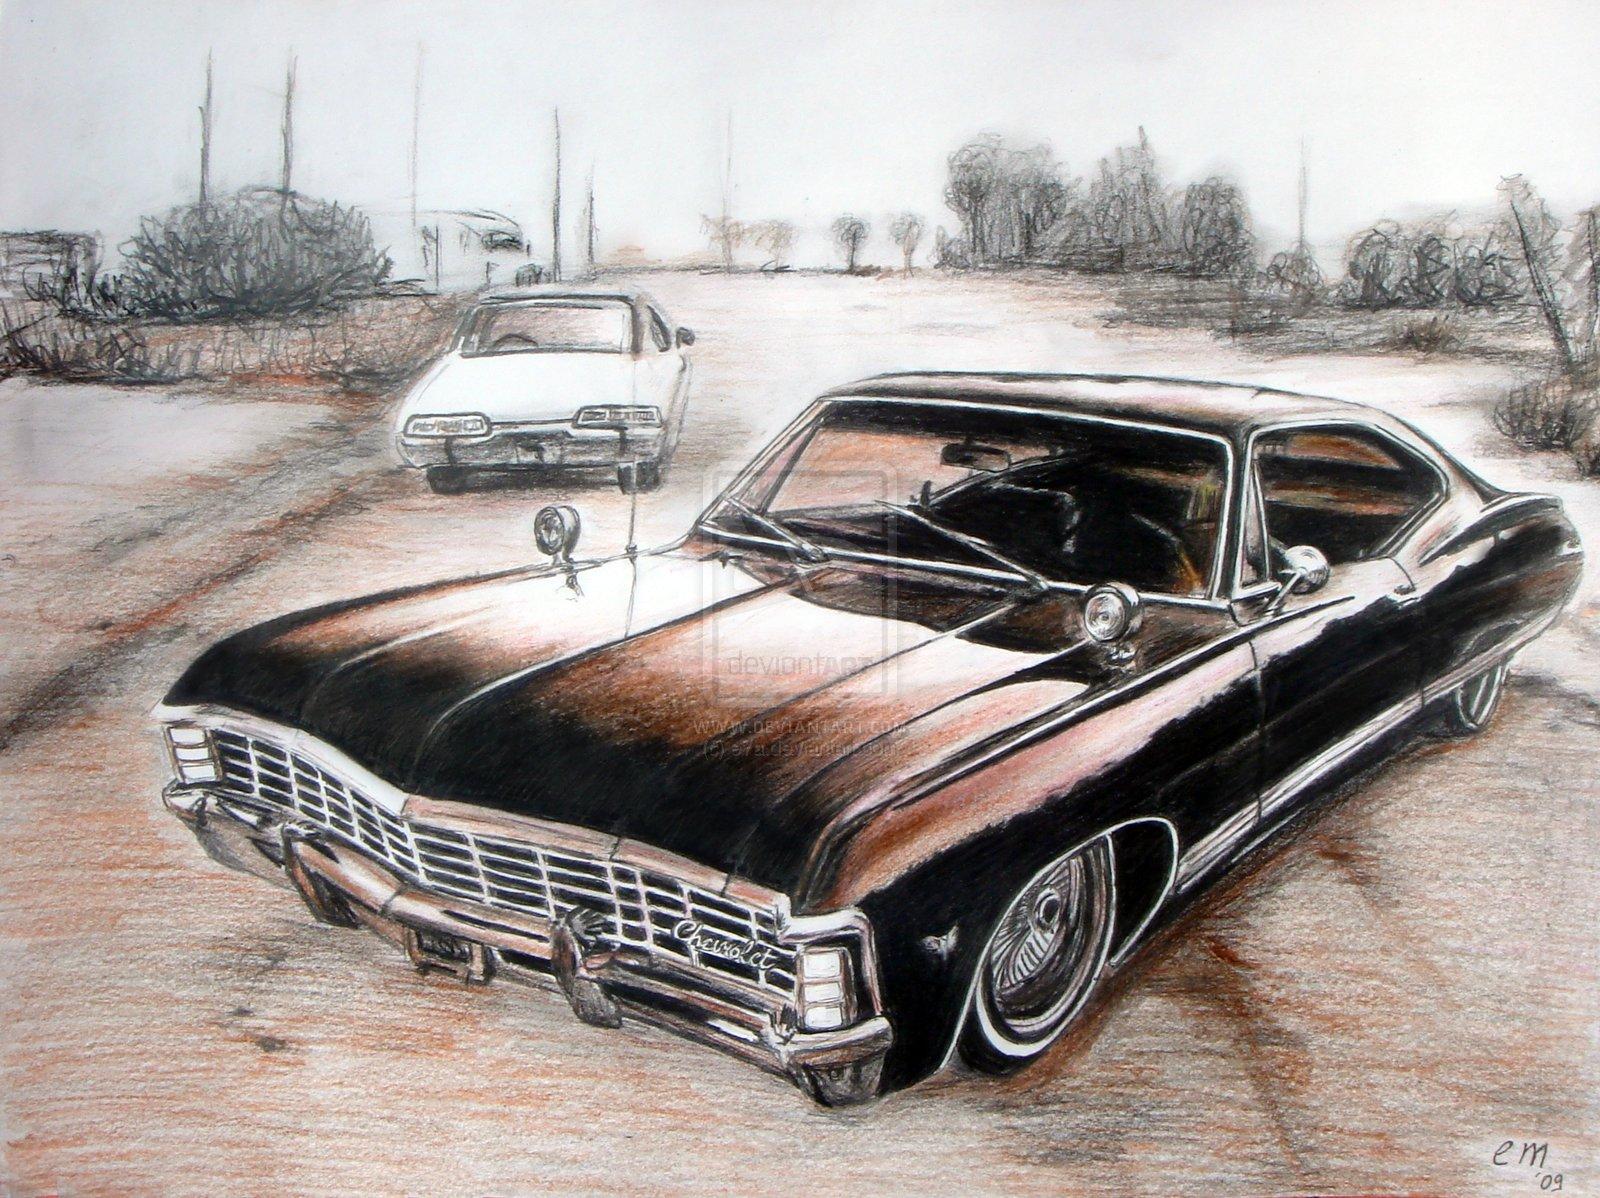 klasik arabalar 1967 chevrolet impala. Black Bedroom Furniture Sets. Home Design Ideas